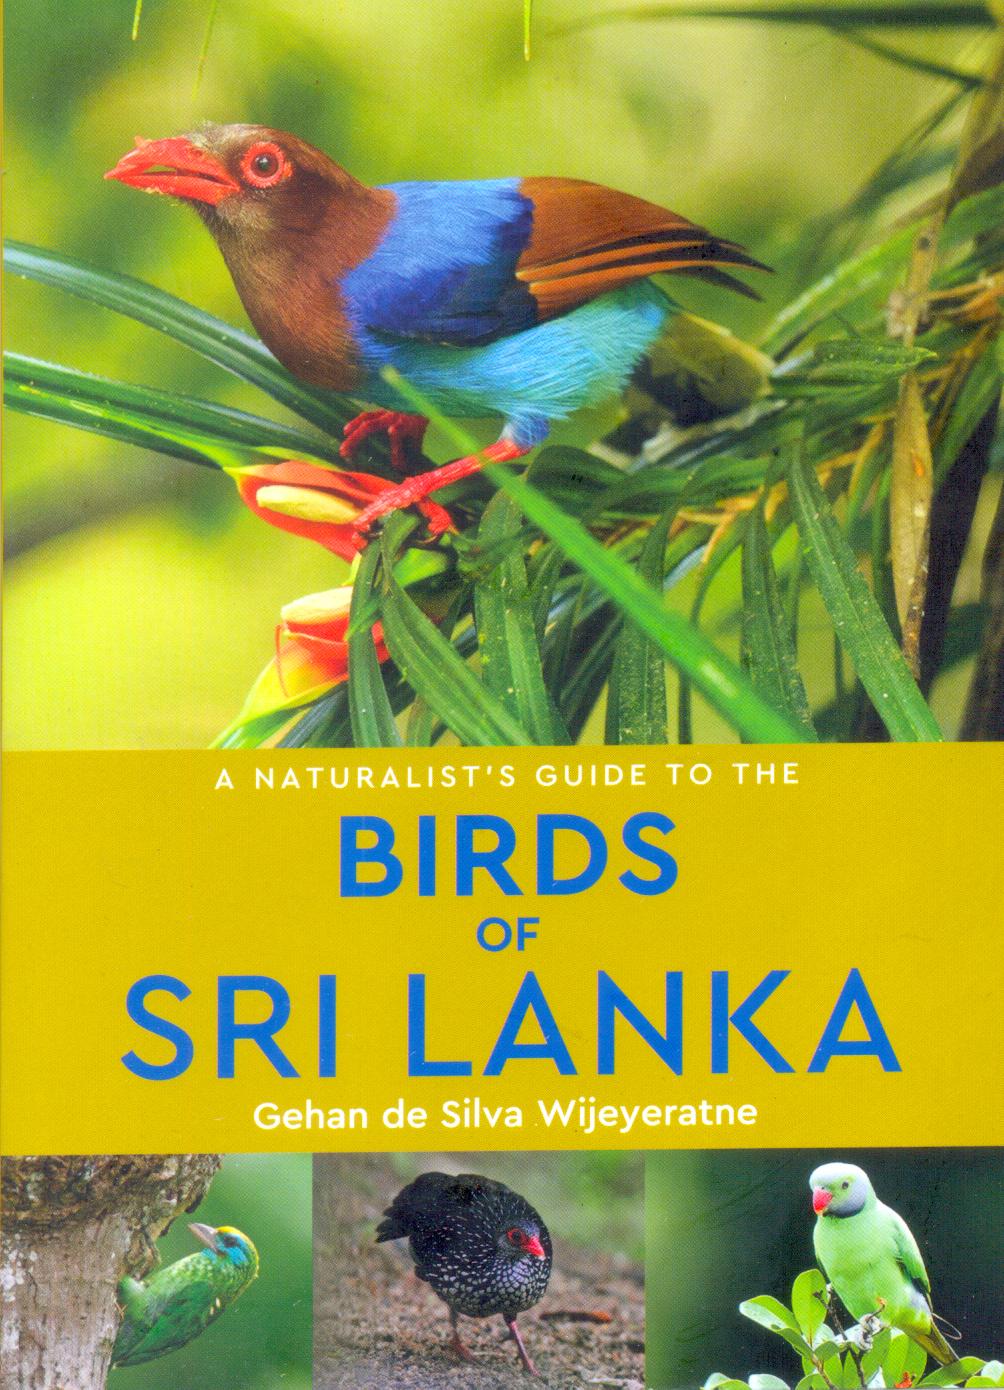 Sri Lanka Books|Vijitha Yapa|Buy Sri Lankan Books Online|Buy